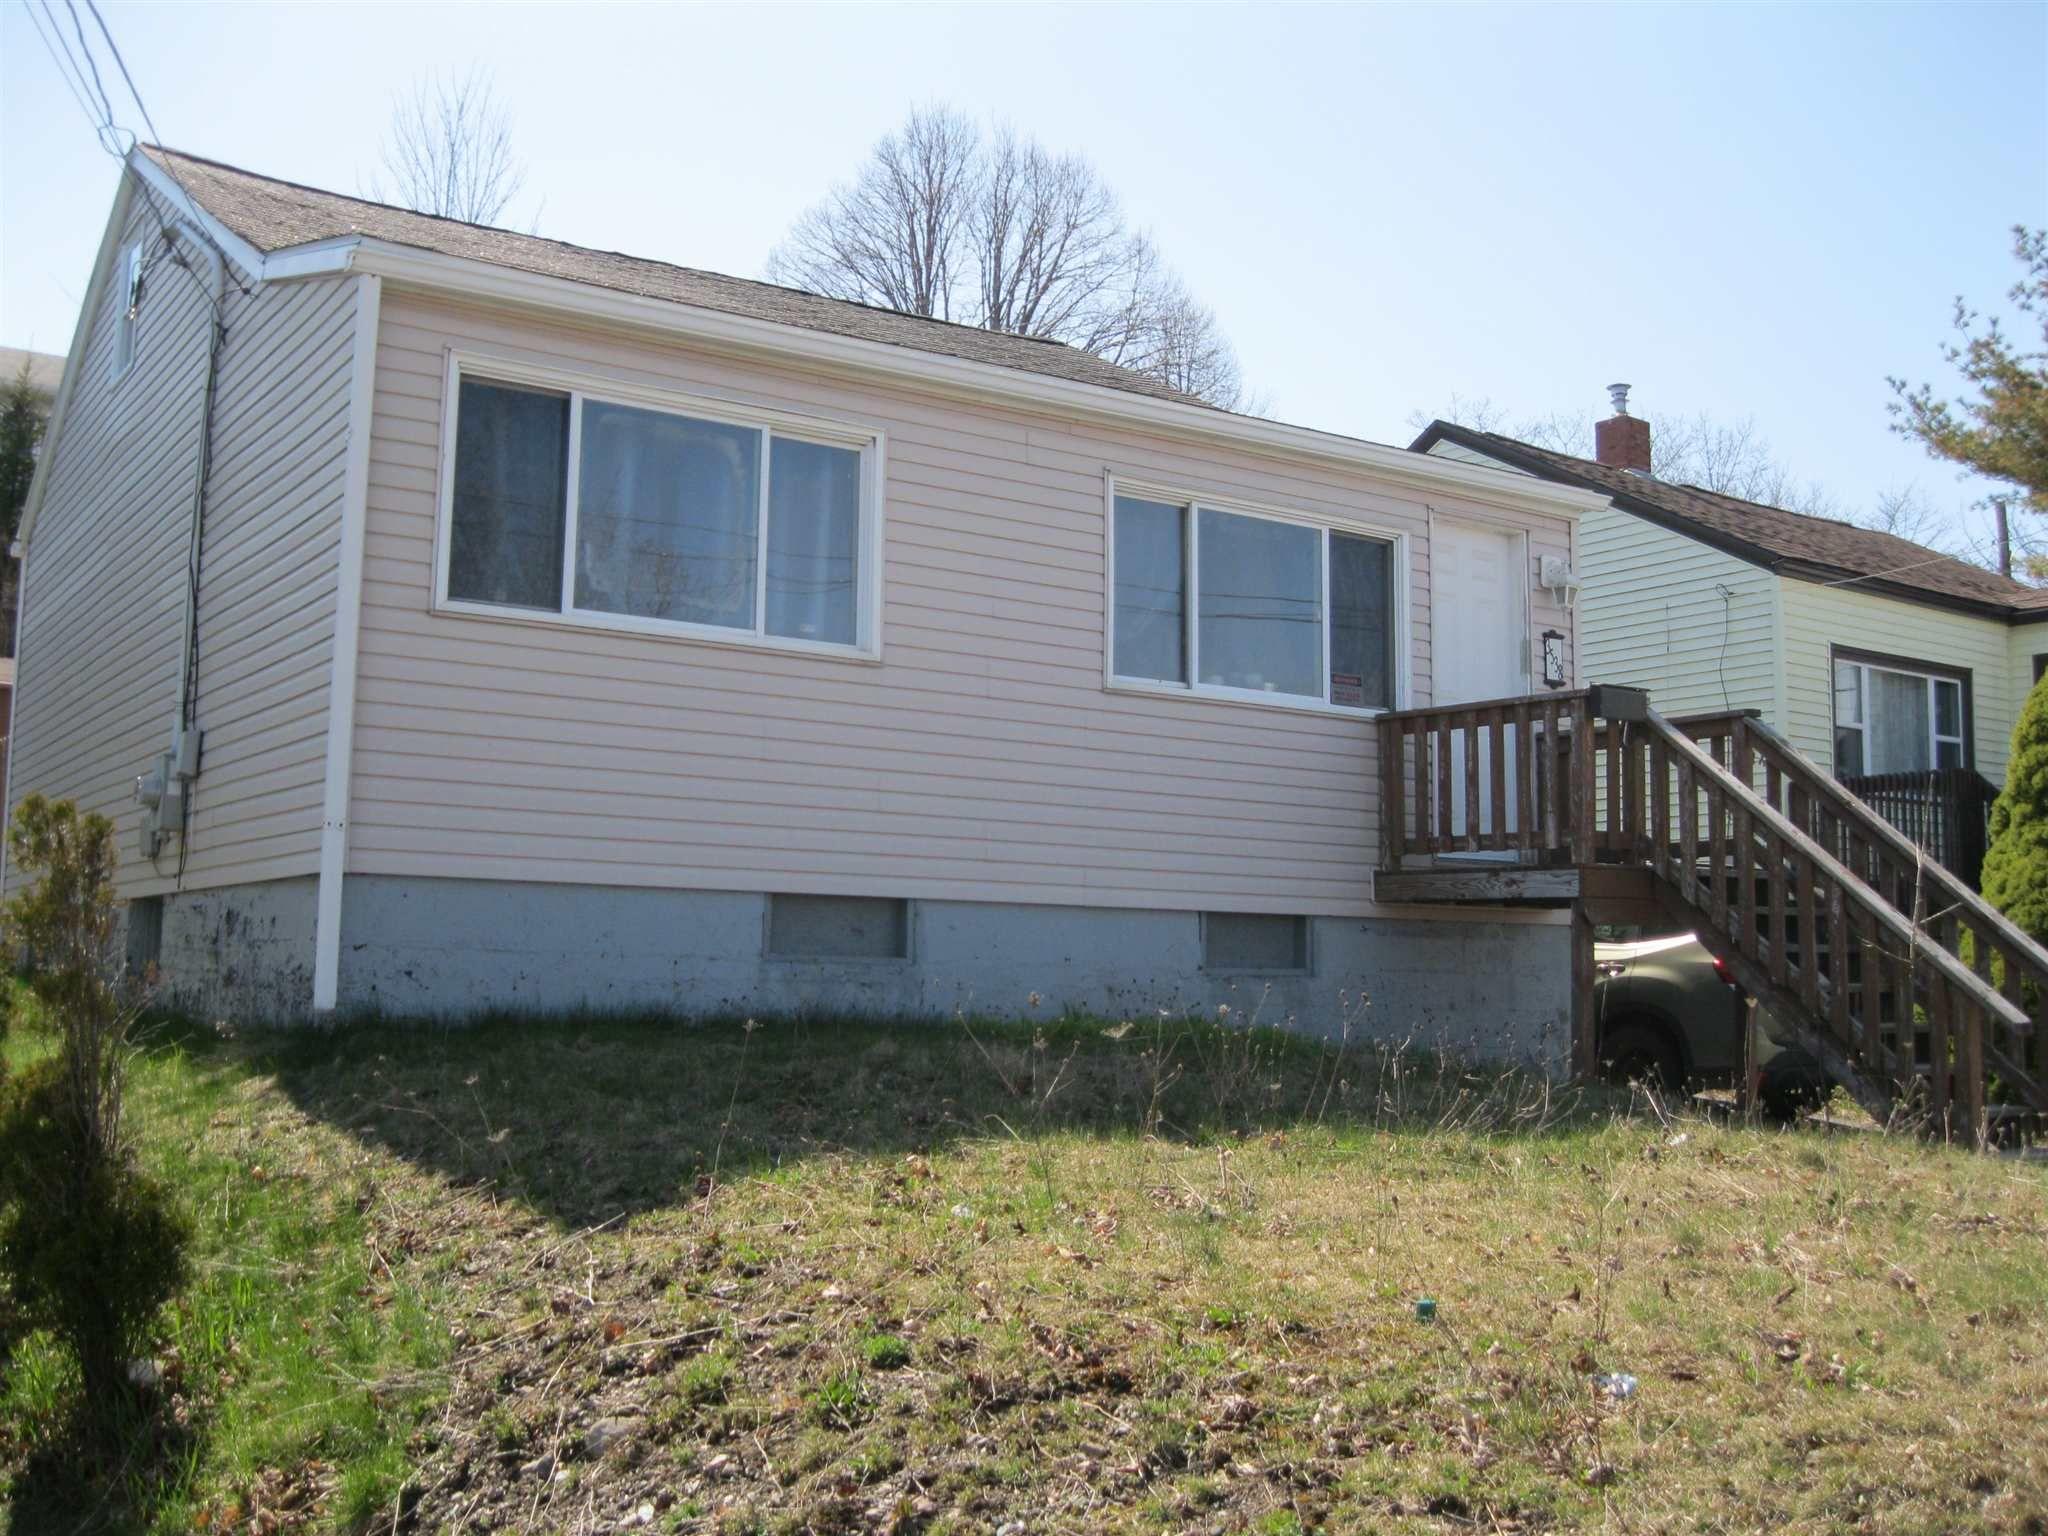 Main Photo: 3538 Barrington Street in Halifax: 3-Halifax North Residential for sale (Halifax-Dartmouth)  : MLS®# 202109502